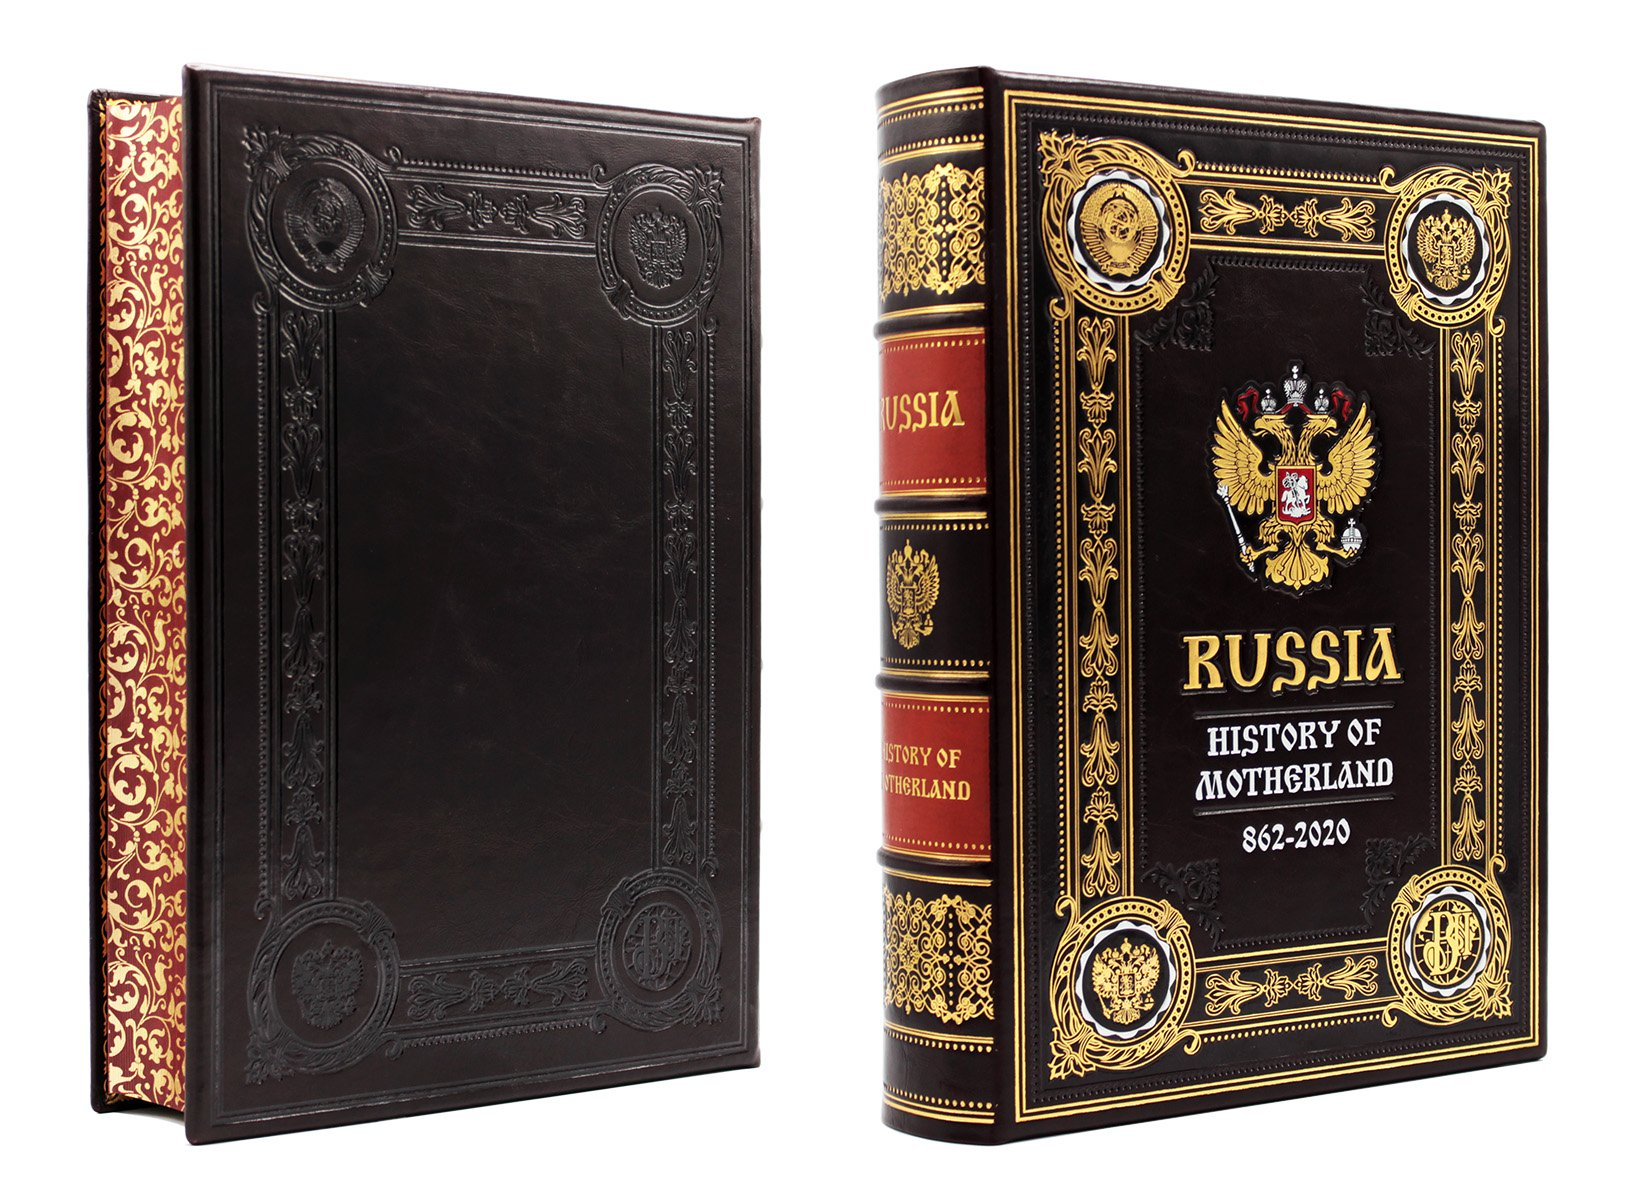 Подарочная книга Russia History of Motherland 862-2020 фото книг